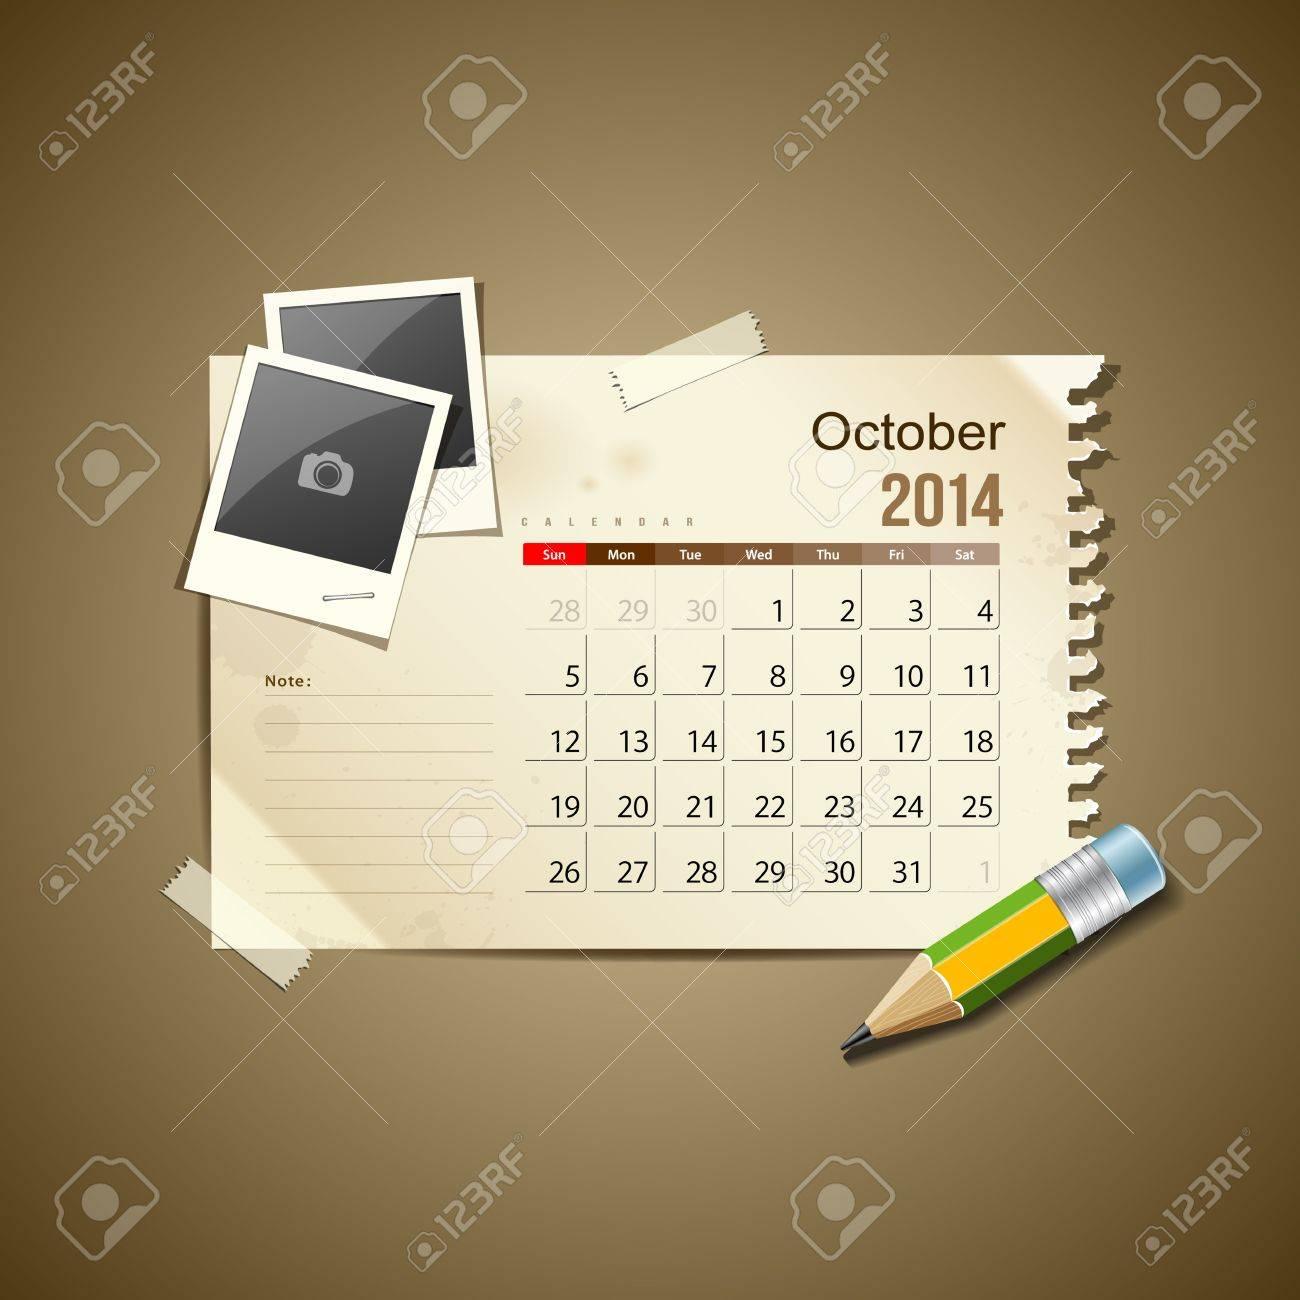 Calendar October 2014, vintage paper note Stock Vector - 21087281